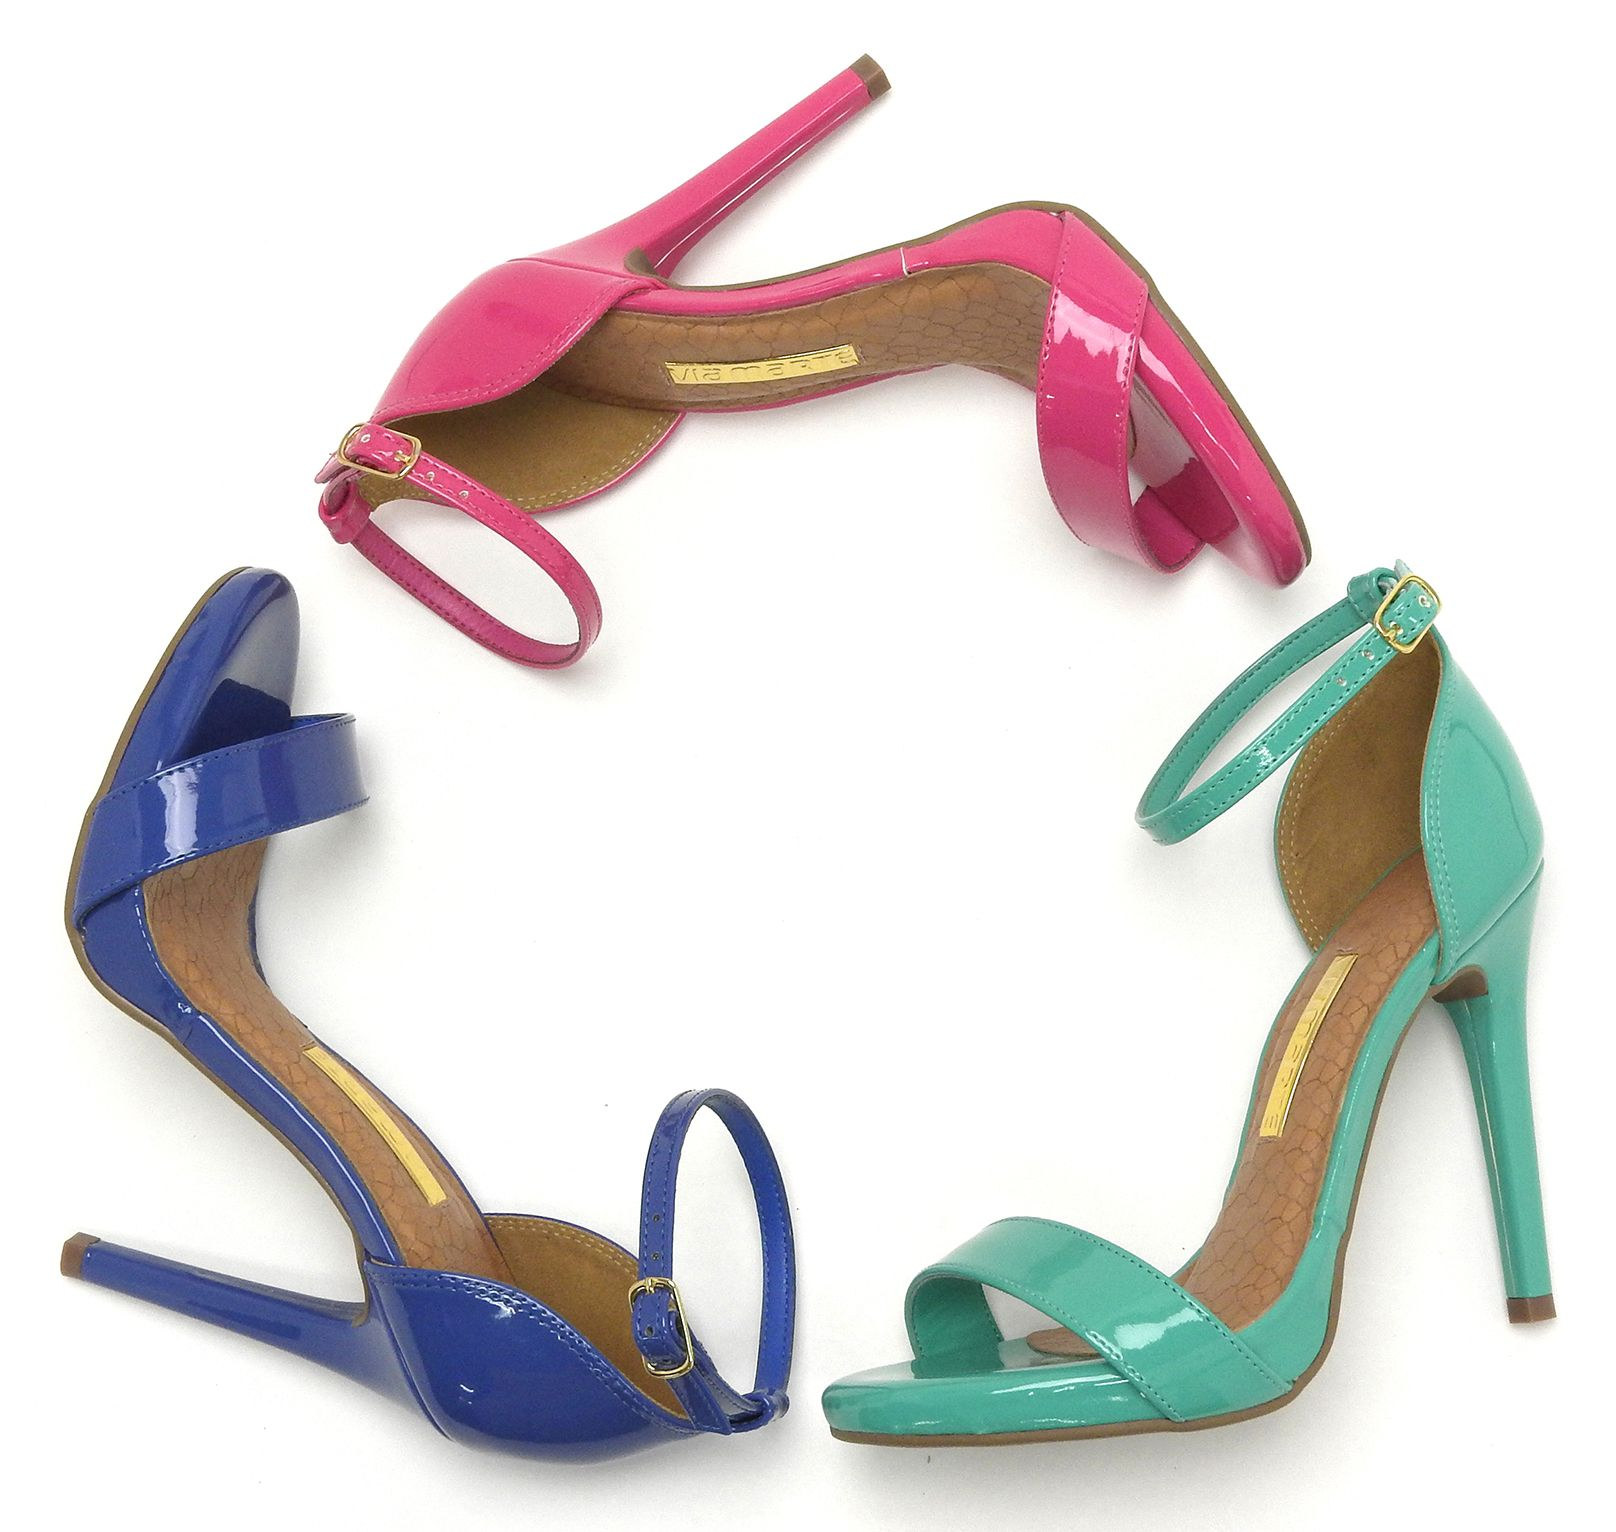 f326a013d6 Sandália de salto alto – heels – cores – rosa – pink – azul - summer – Verão  2016 - Ref. 15-19001